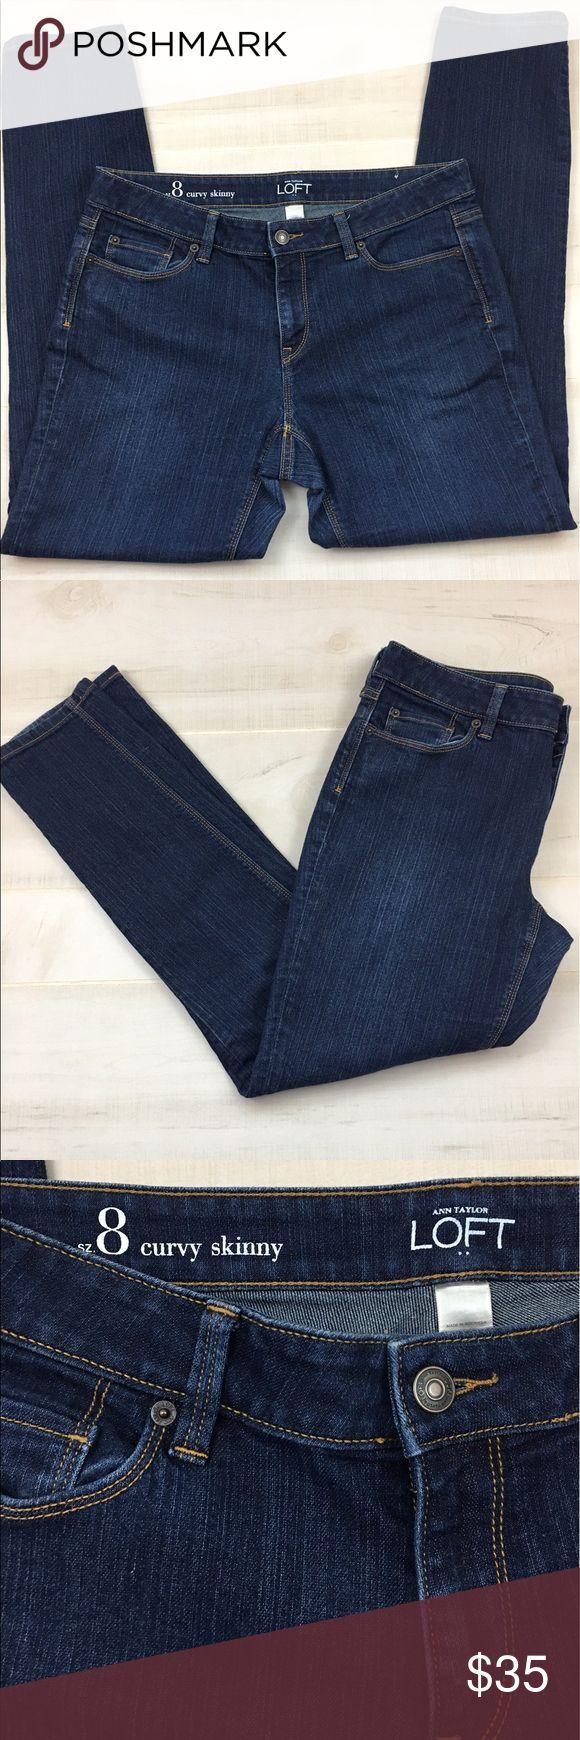 "Ann Taylor loft Skinny Curvy jeans size 8 Loft Skinny Curvy jeans like New size 8. Inseam 29""L LOFT Jeans Skinny"